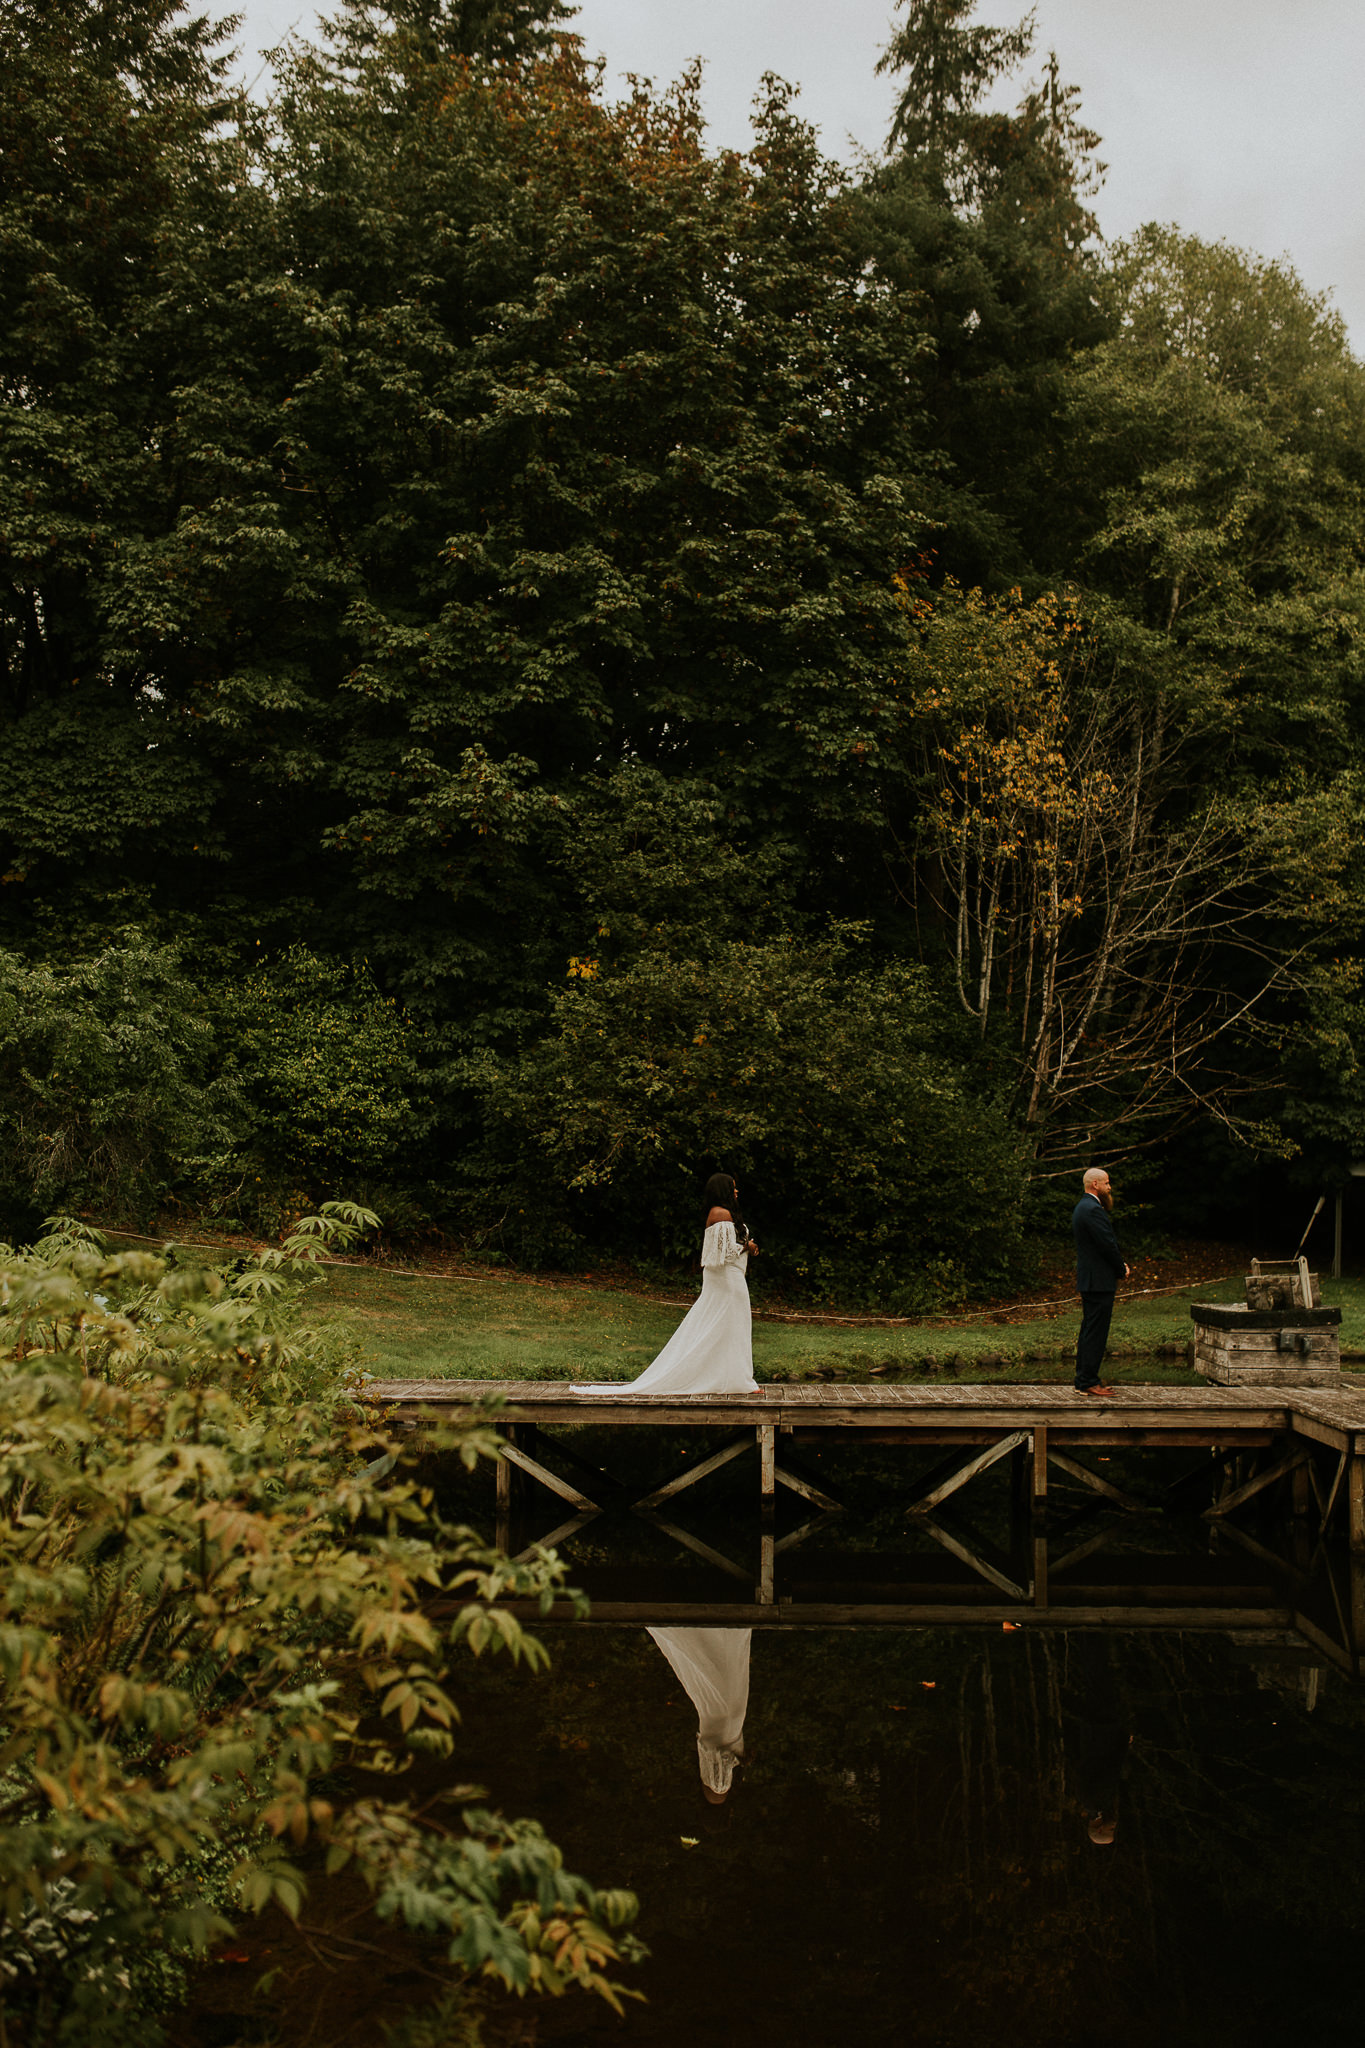 Lakeside-elopement-teasers-6.jpg